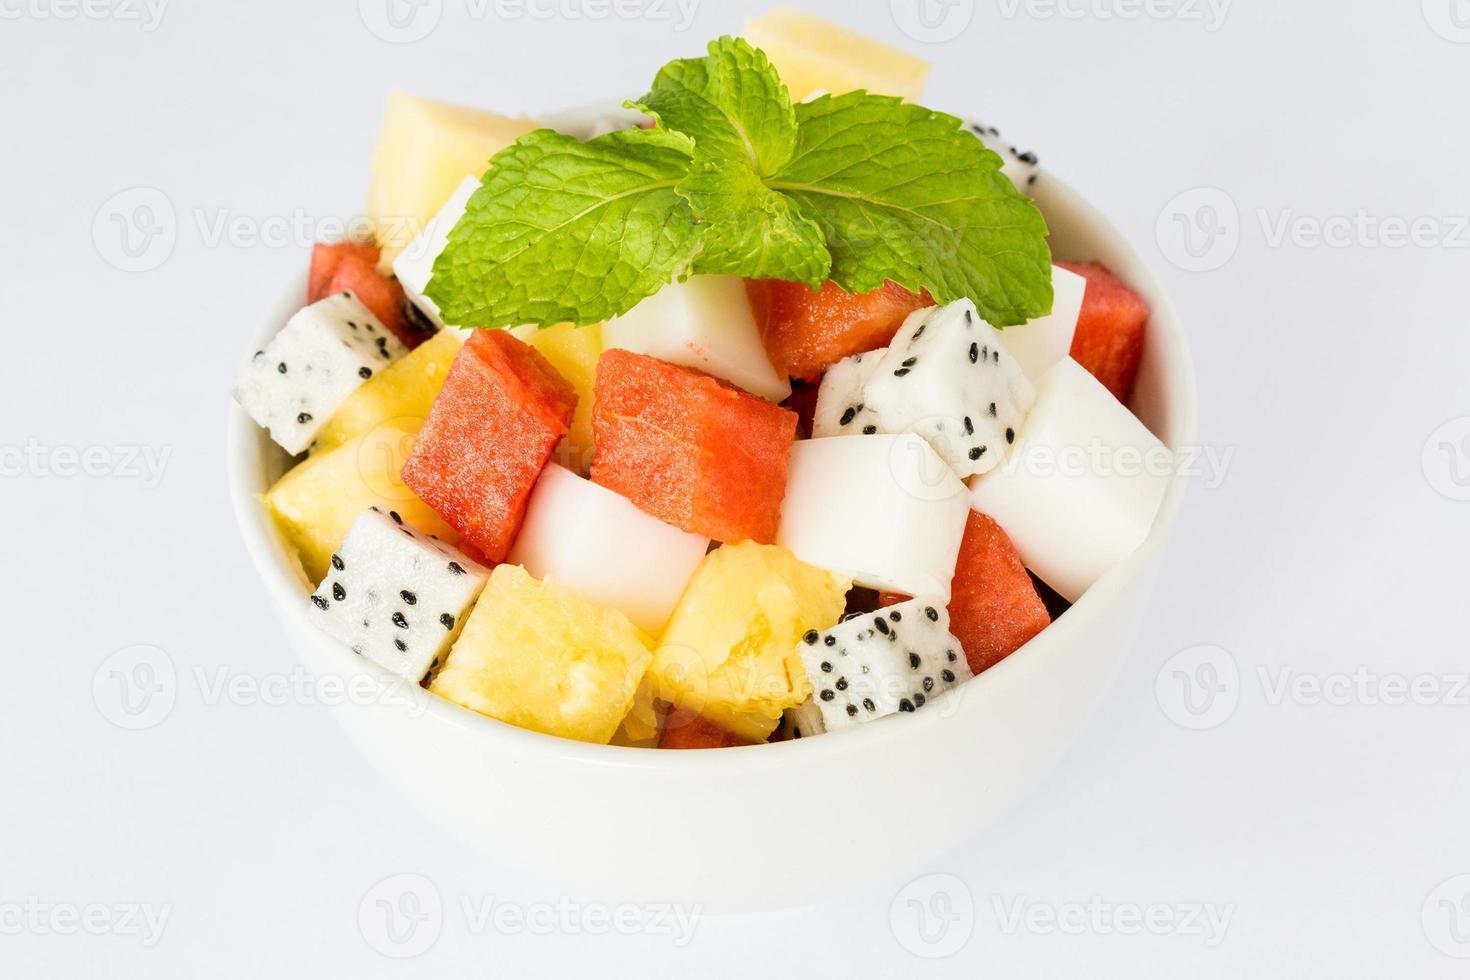 salade de fruits et dessert à l'agar photo